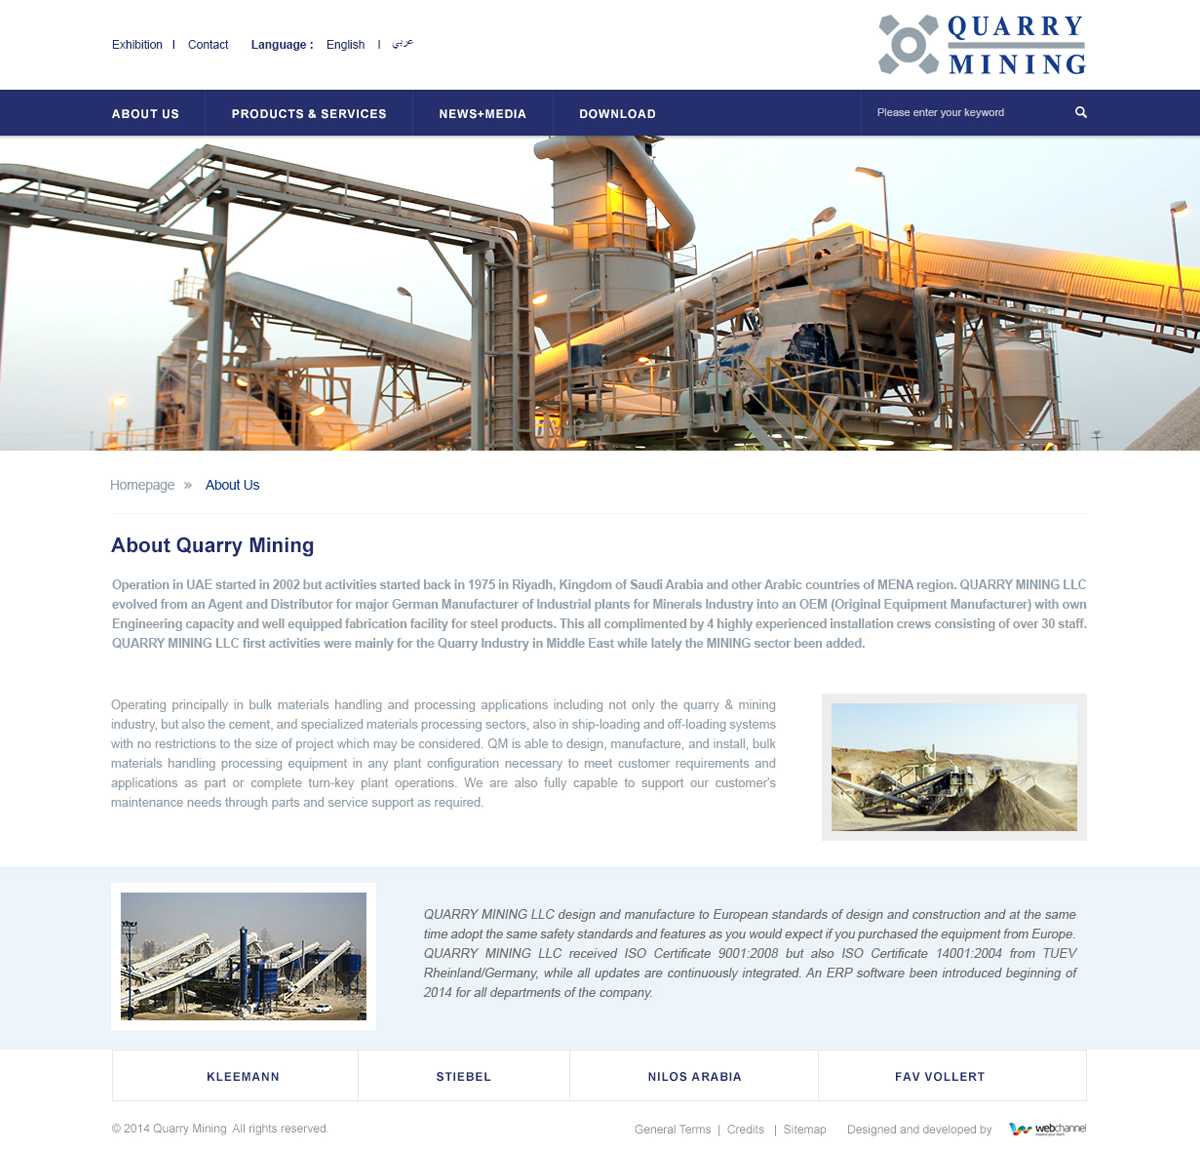 quarry-mining-1.jpg